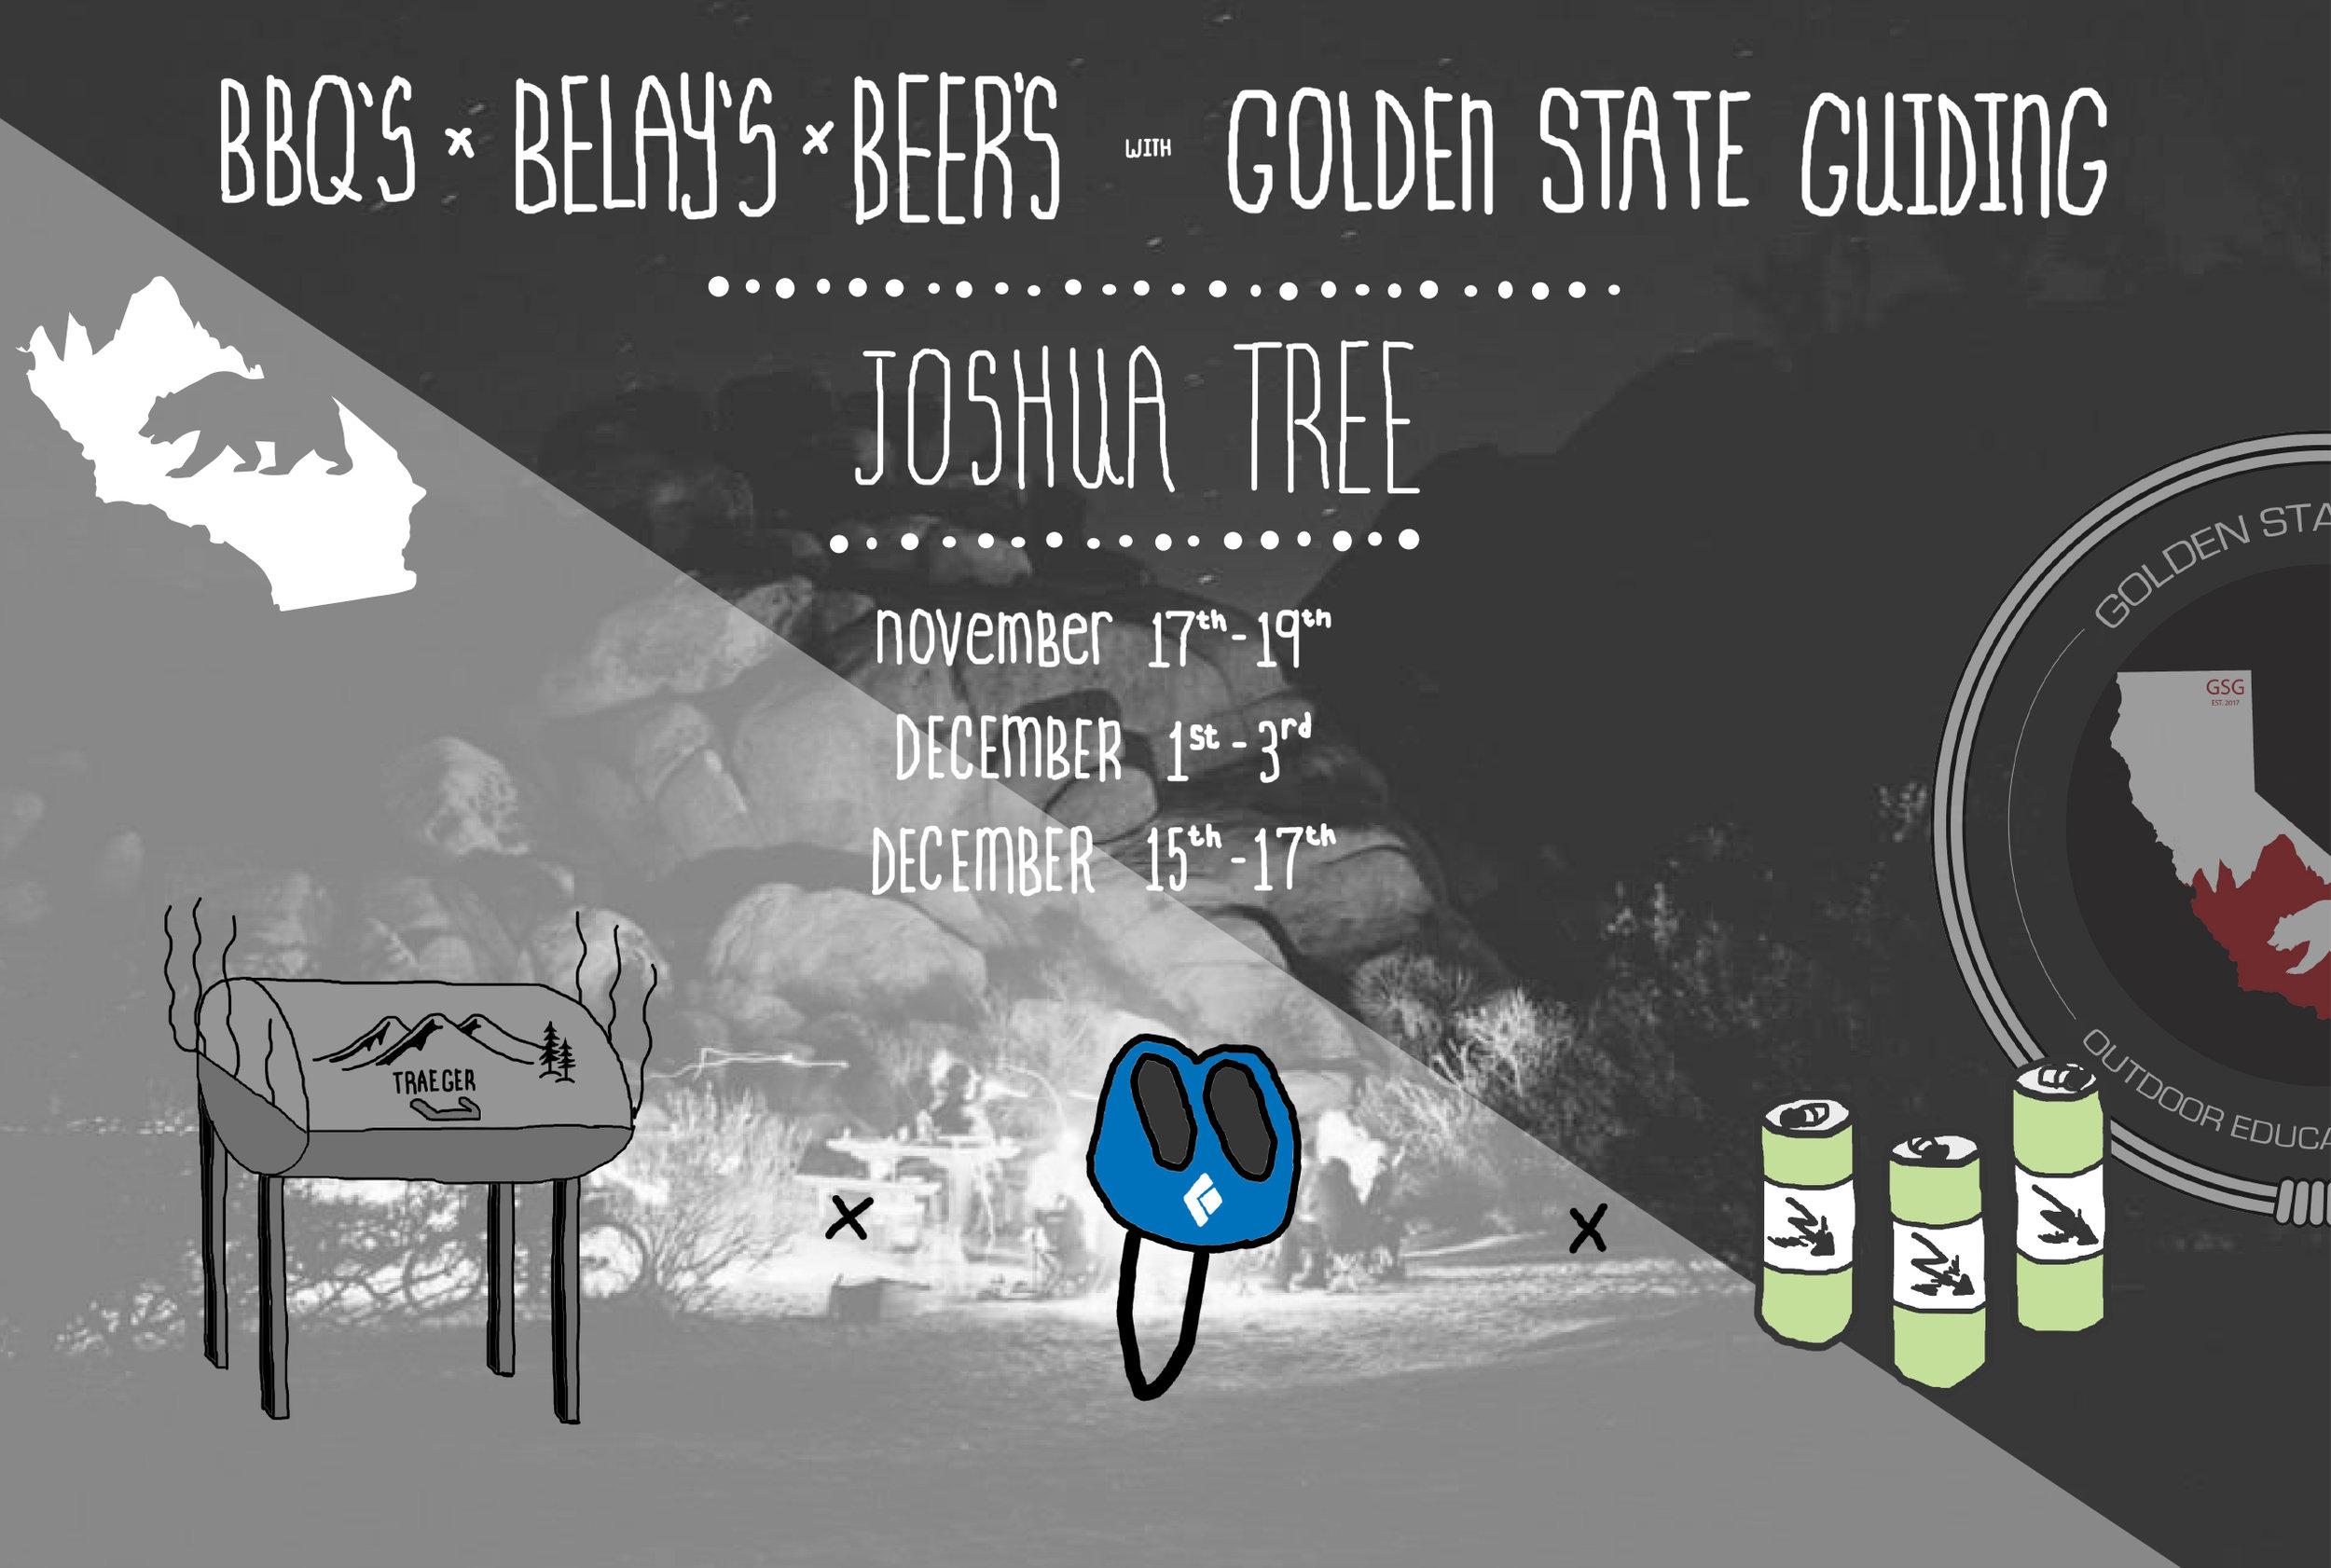 Joshua Tree Rock Climbing Event BBQ's x BELAY's x BEER's